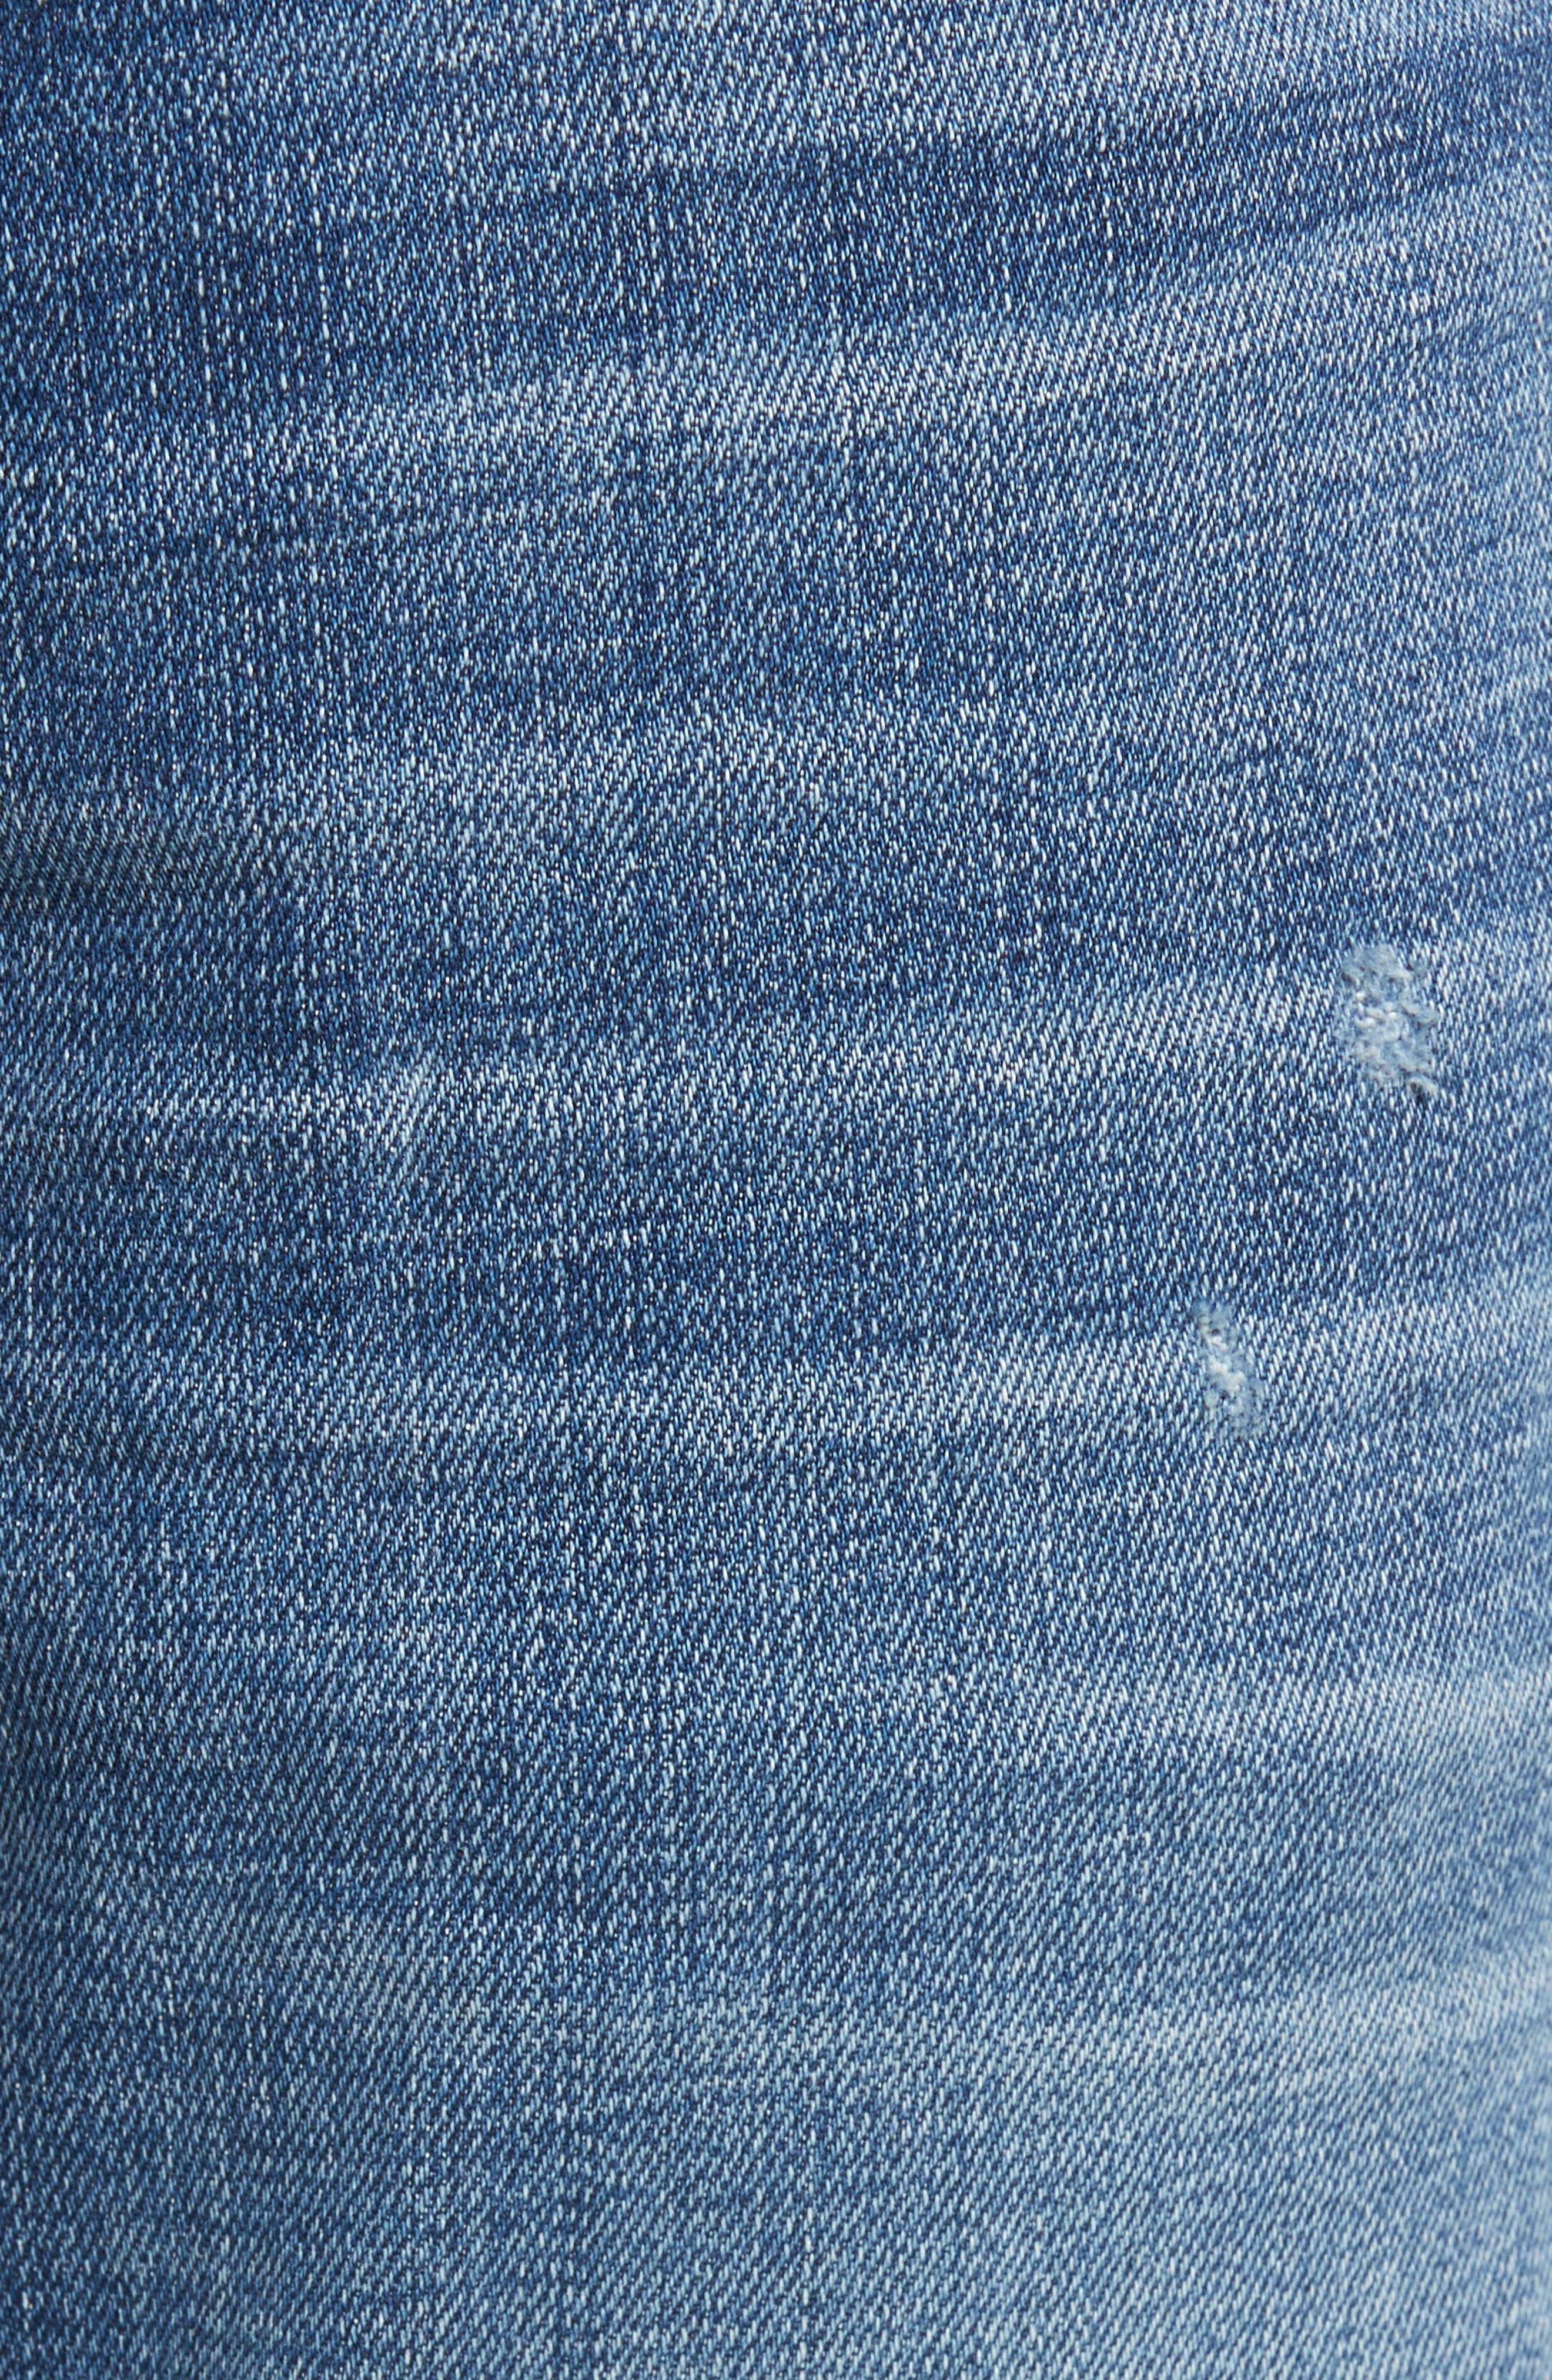 Blake Slim Fit Jeans,                             Alternate thumbnail 5, color,                             453